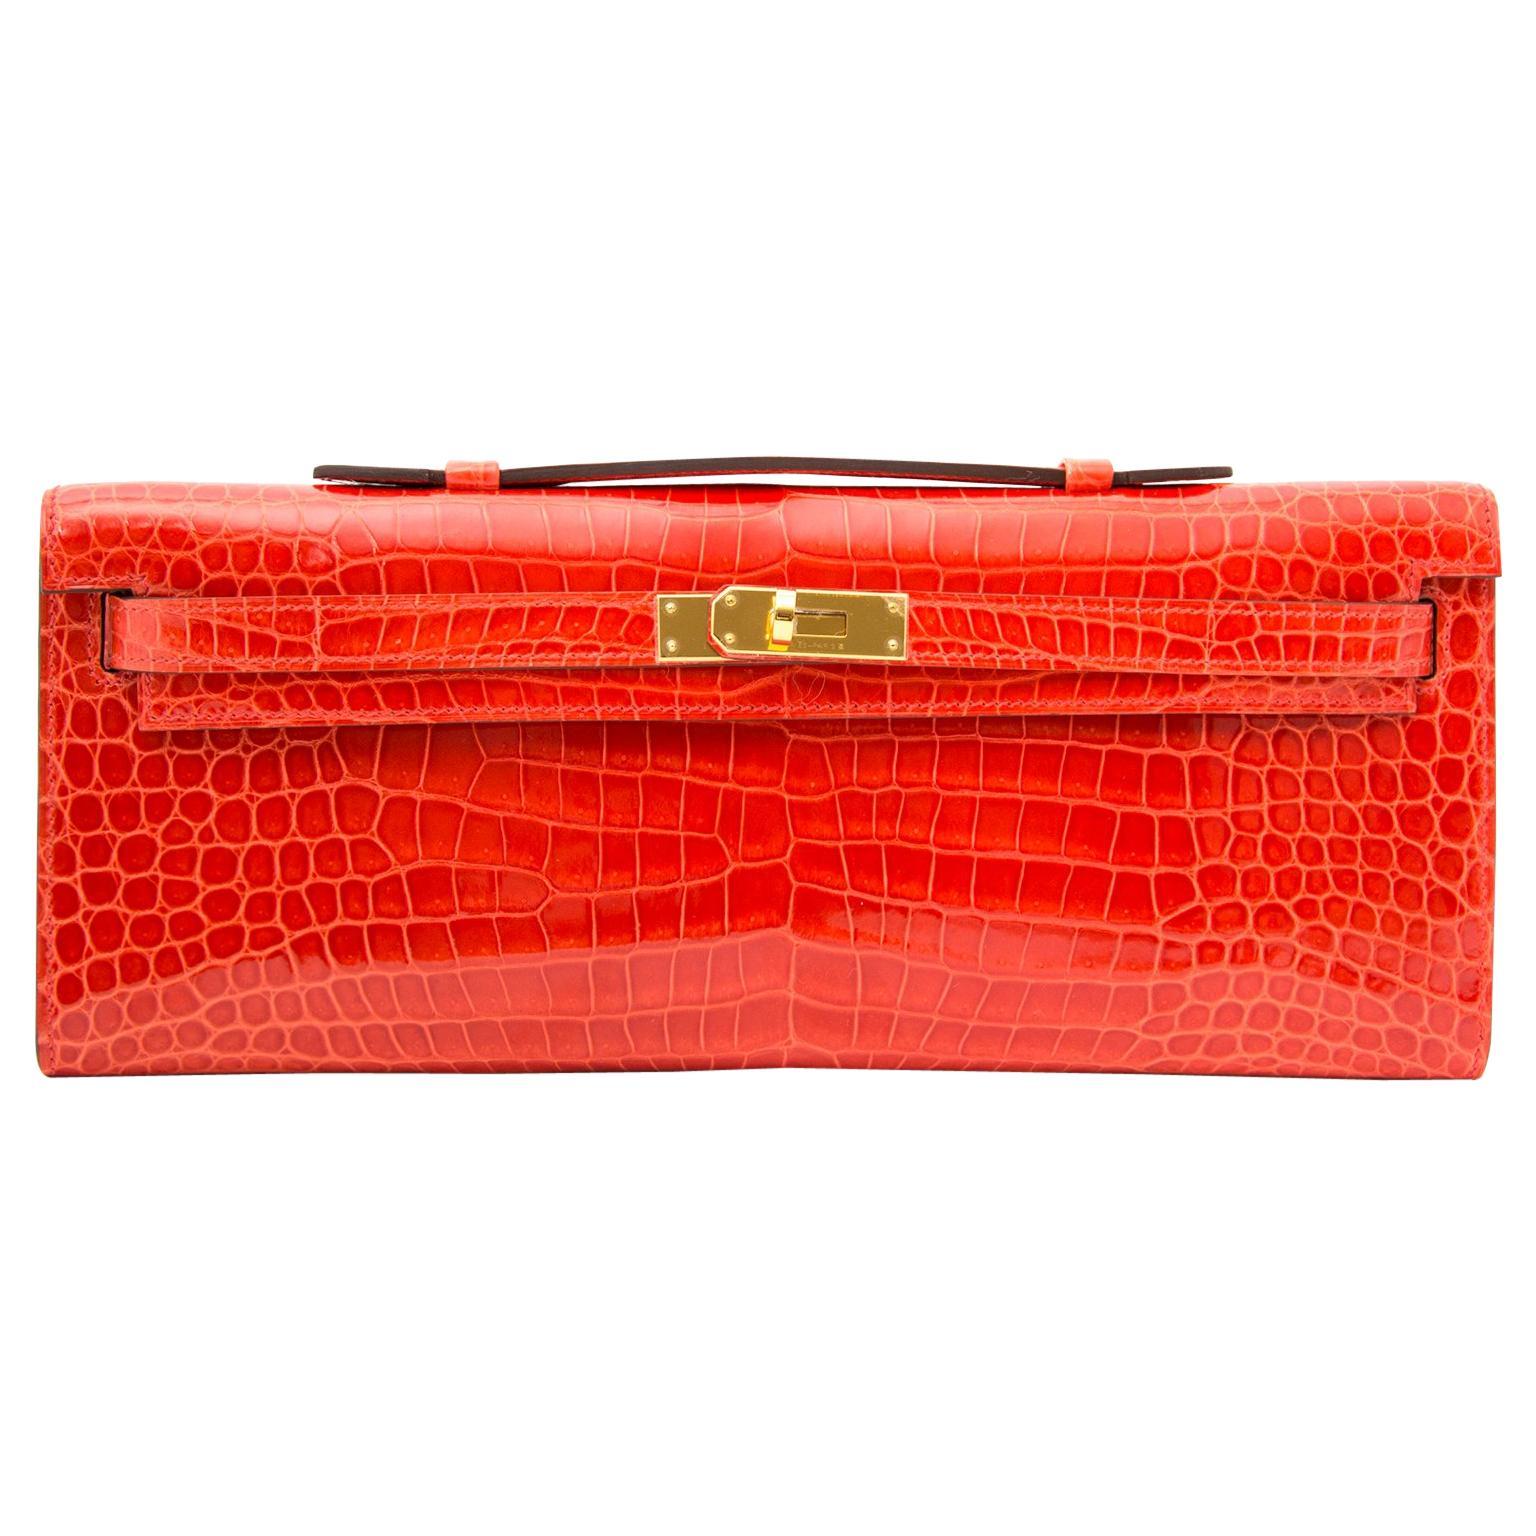 *Never Used* Hermès Kelly Cut pochette crocodile porosus lisse orange